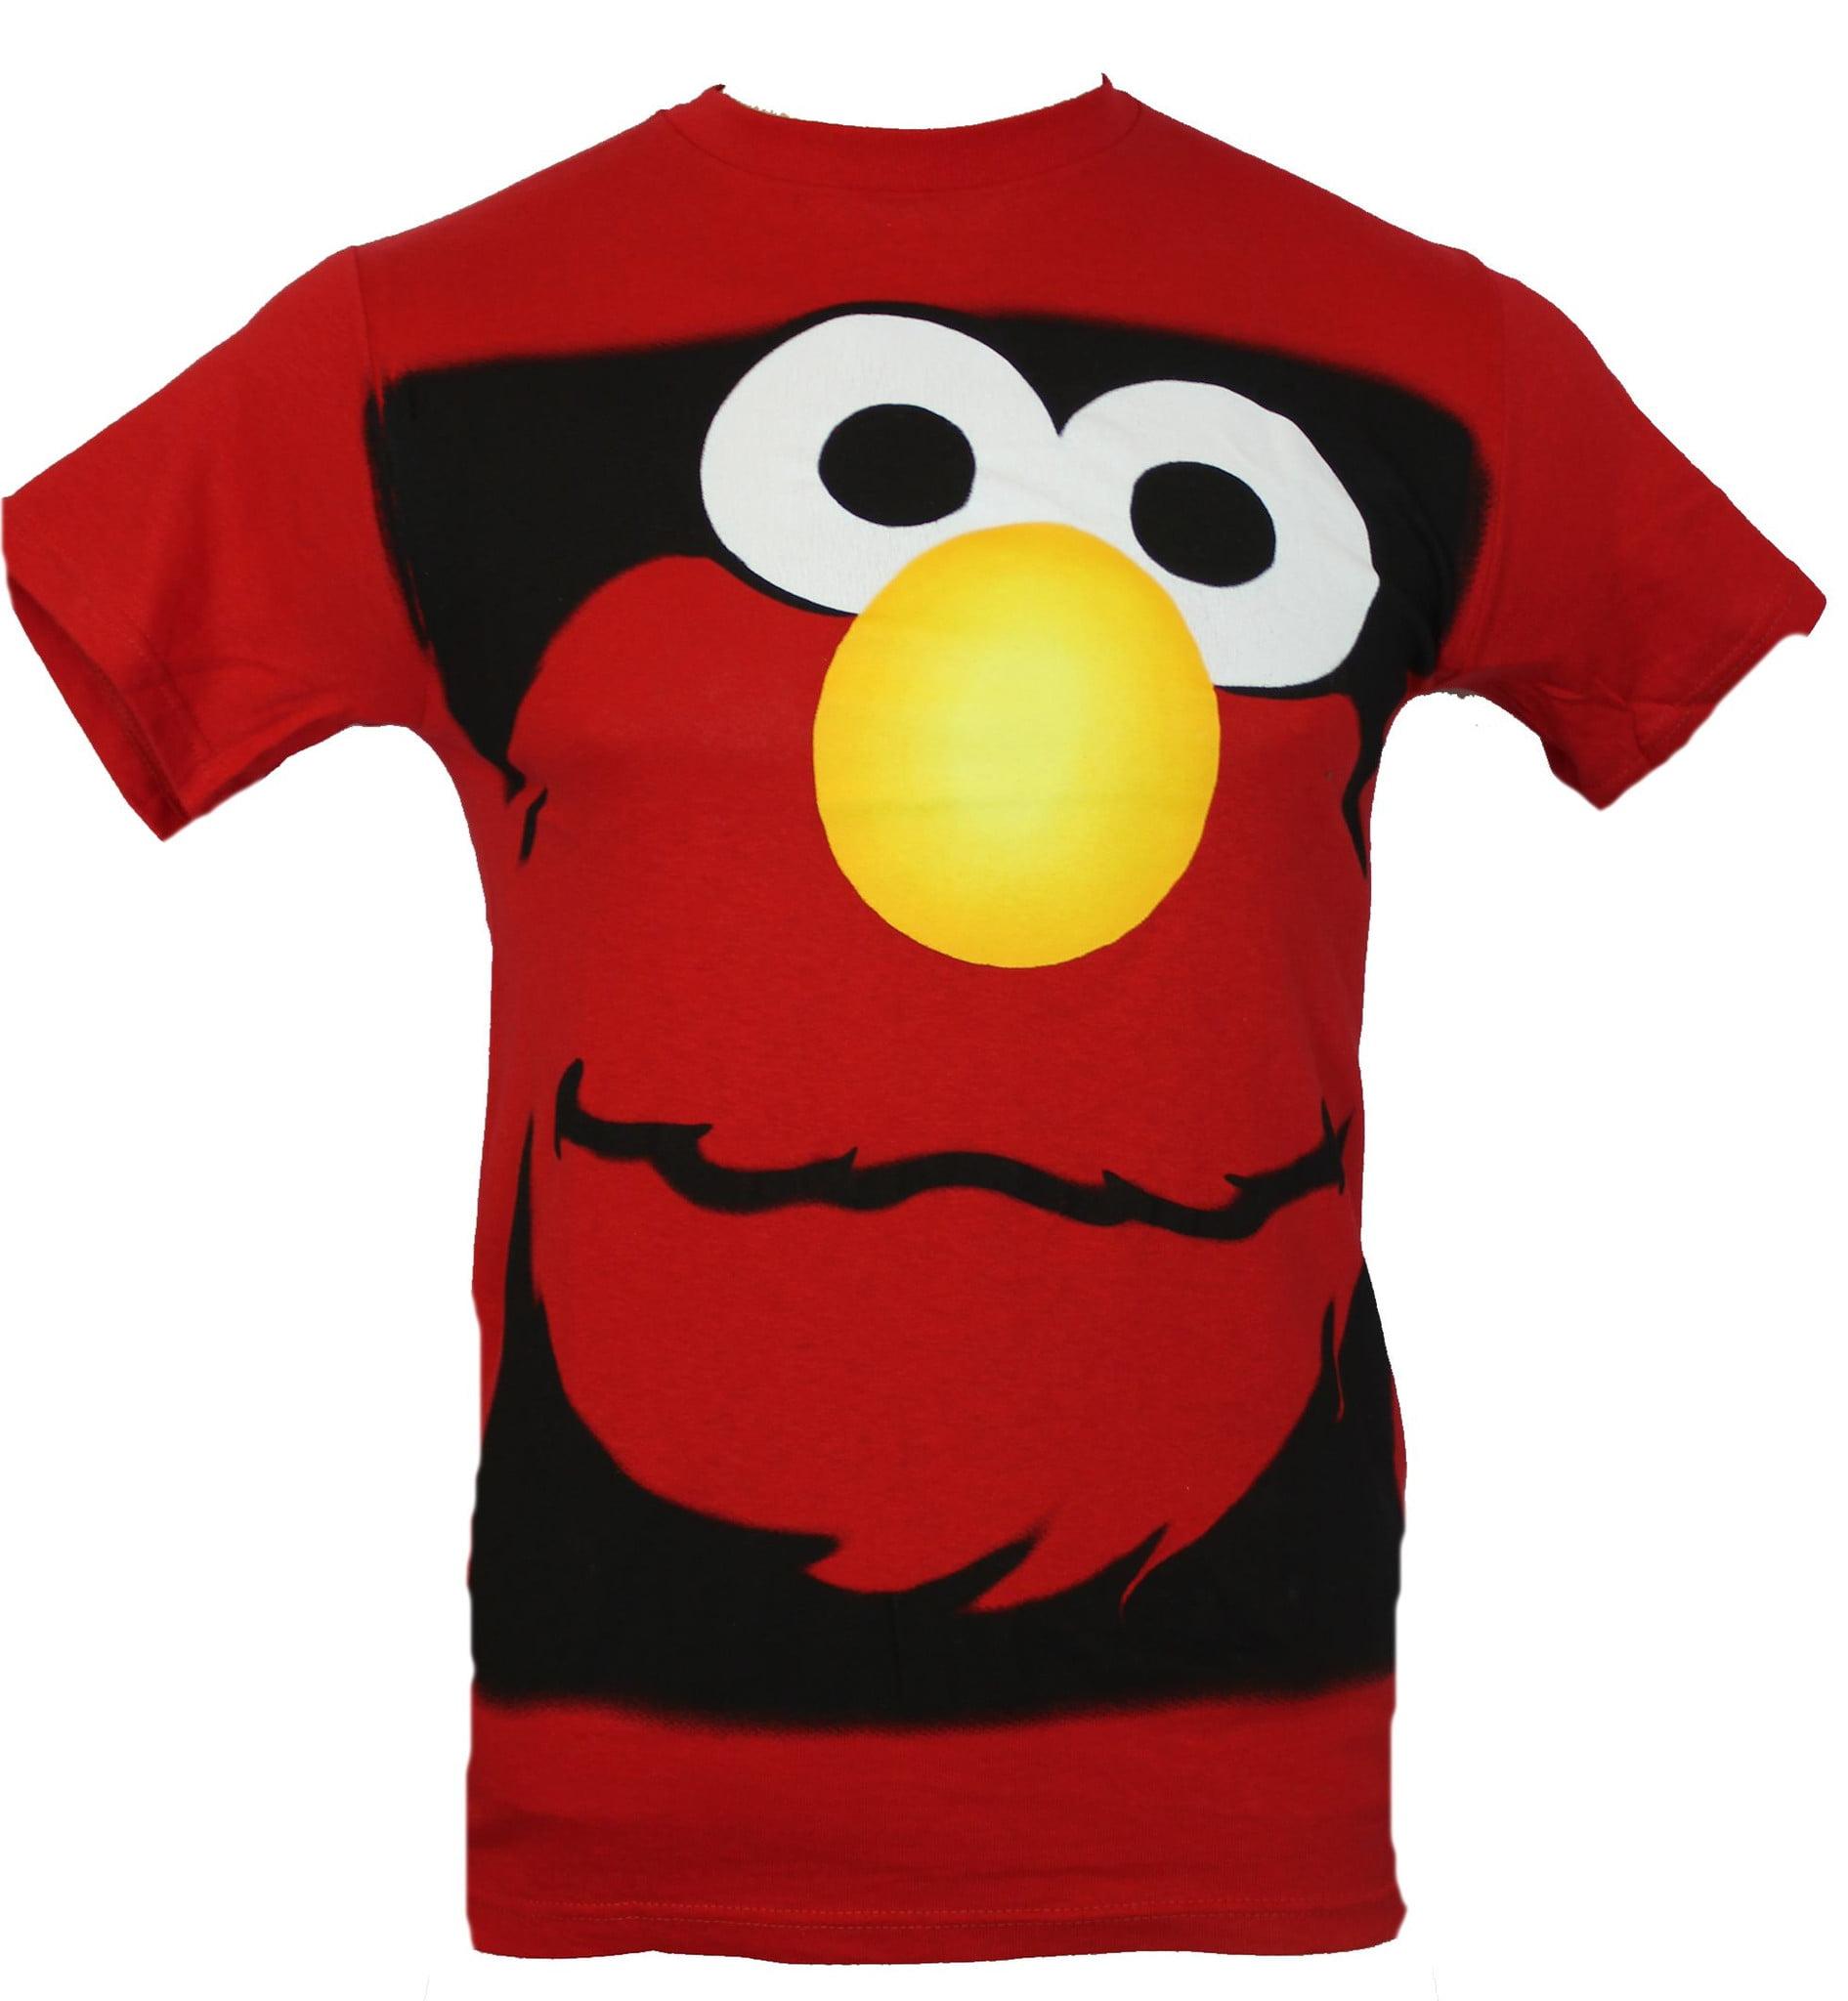 Sesame Street Elmo Face Red Mens T Shirt L Large Size New Official Merchandise